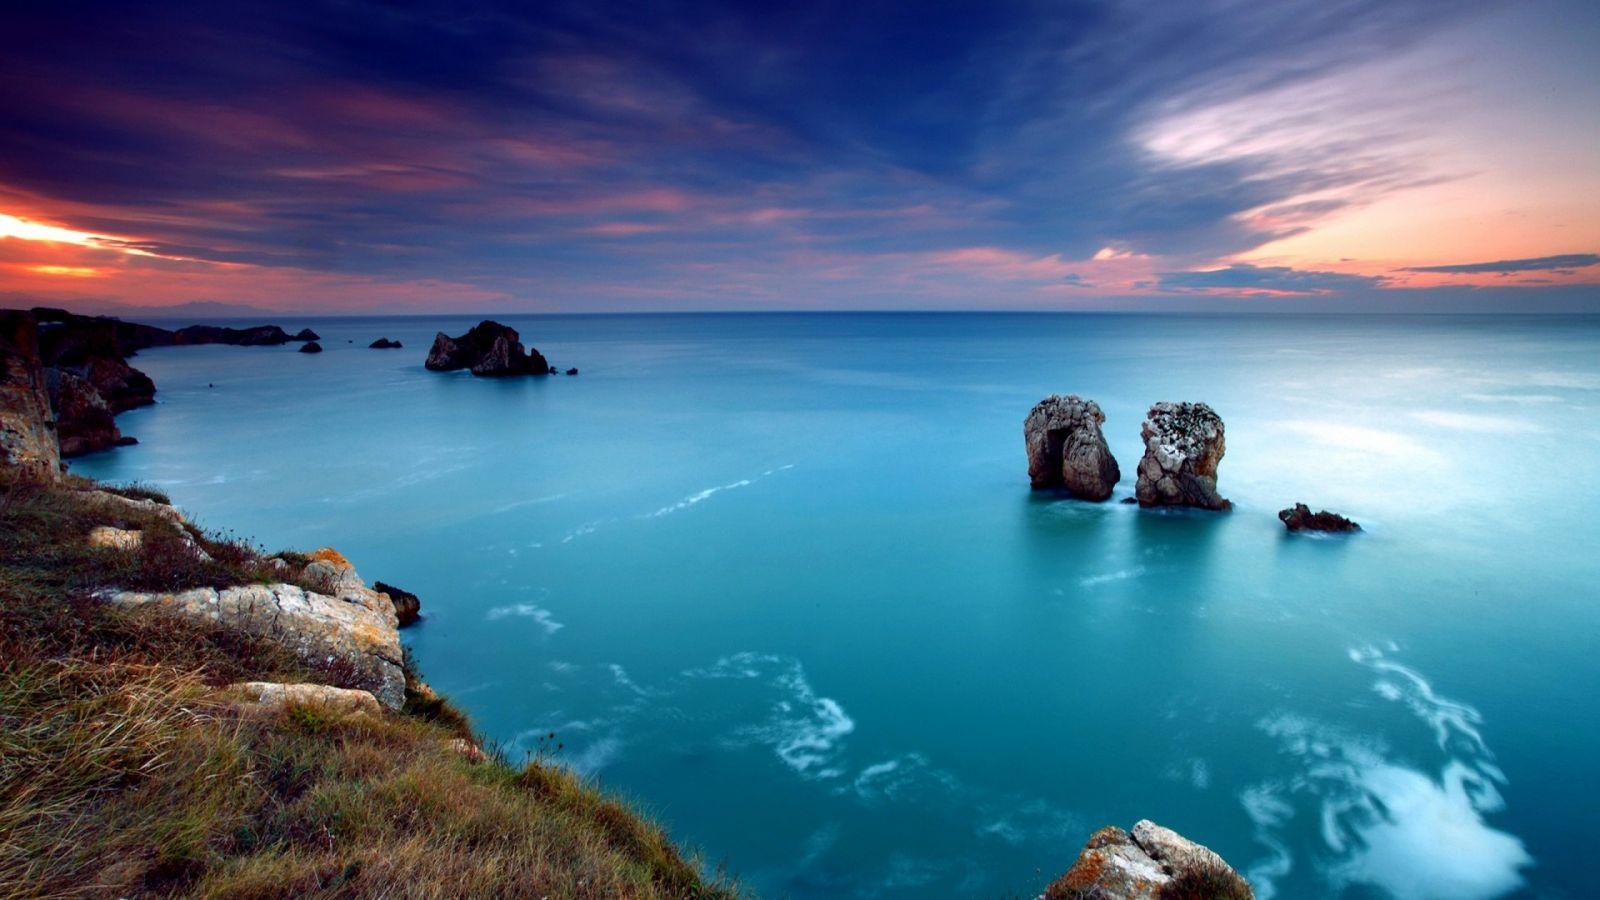 lovely sunsetlandscape nature ocean peaceful Sea